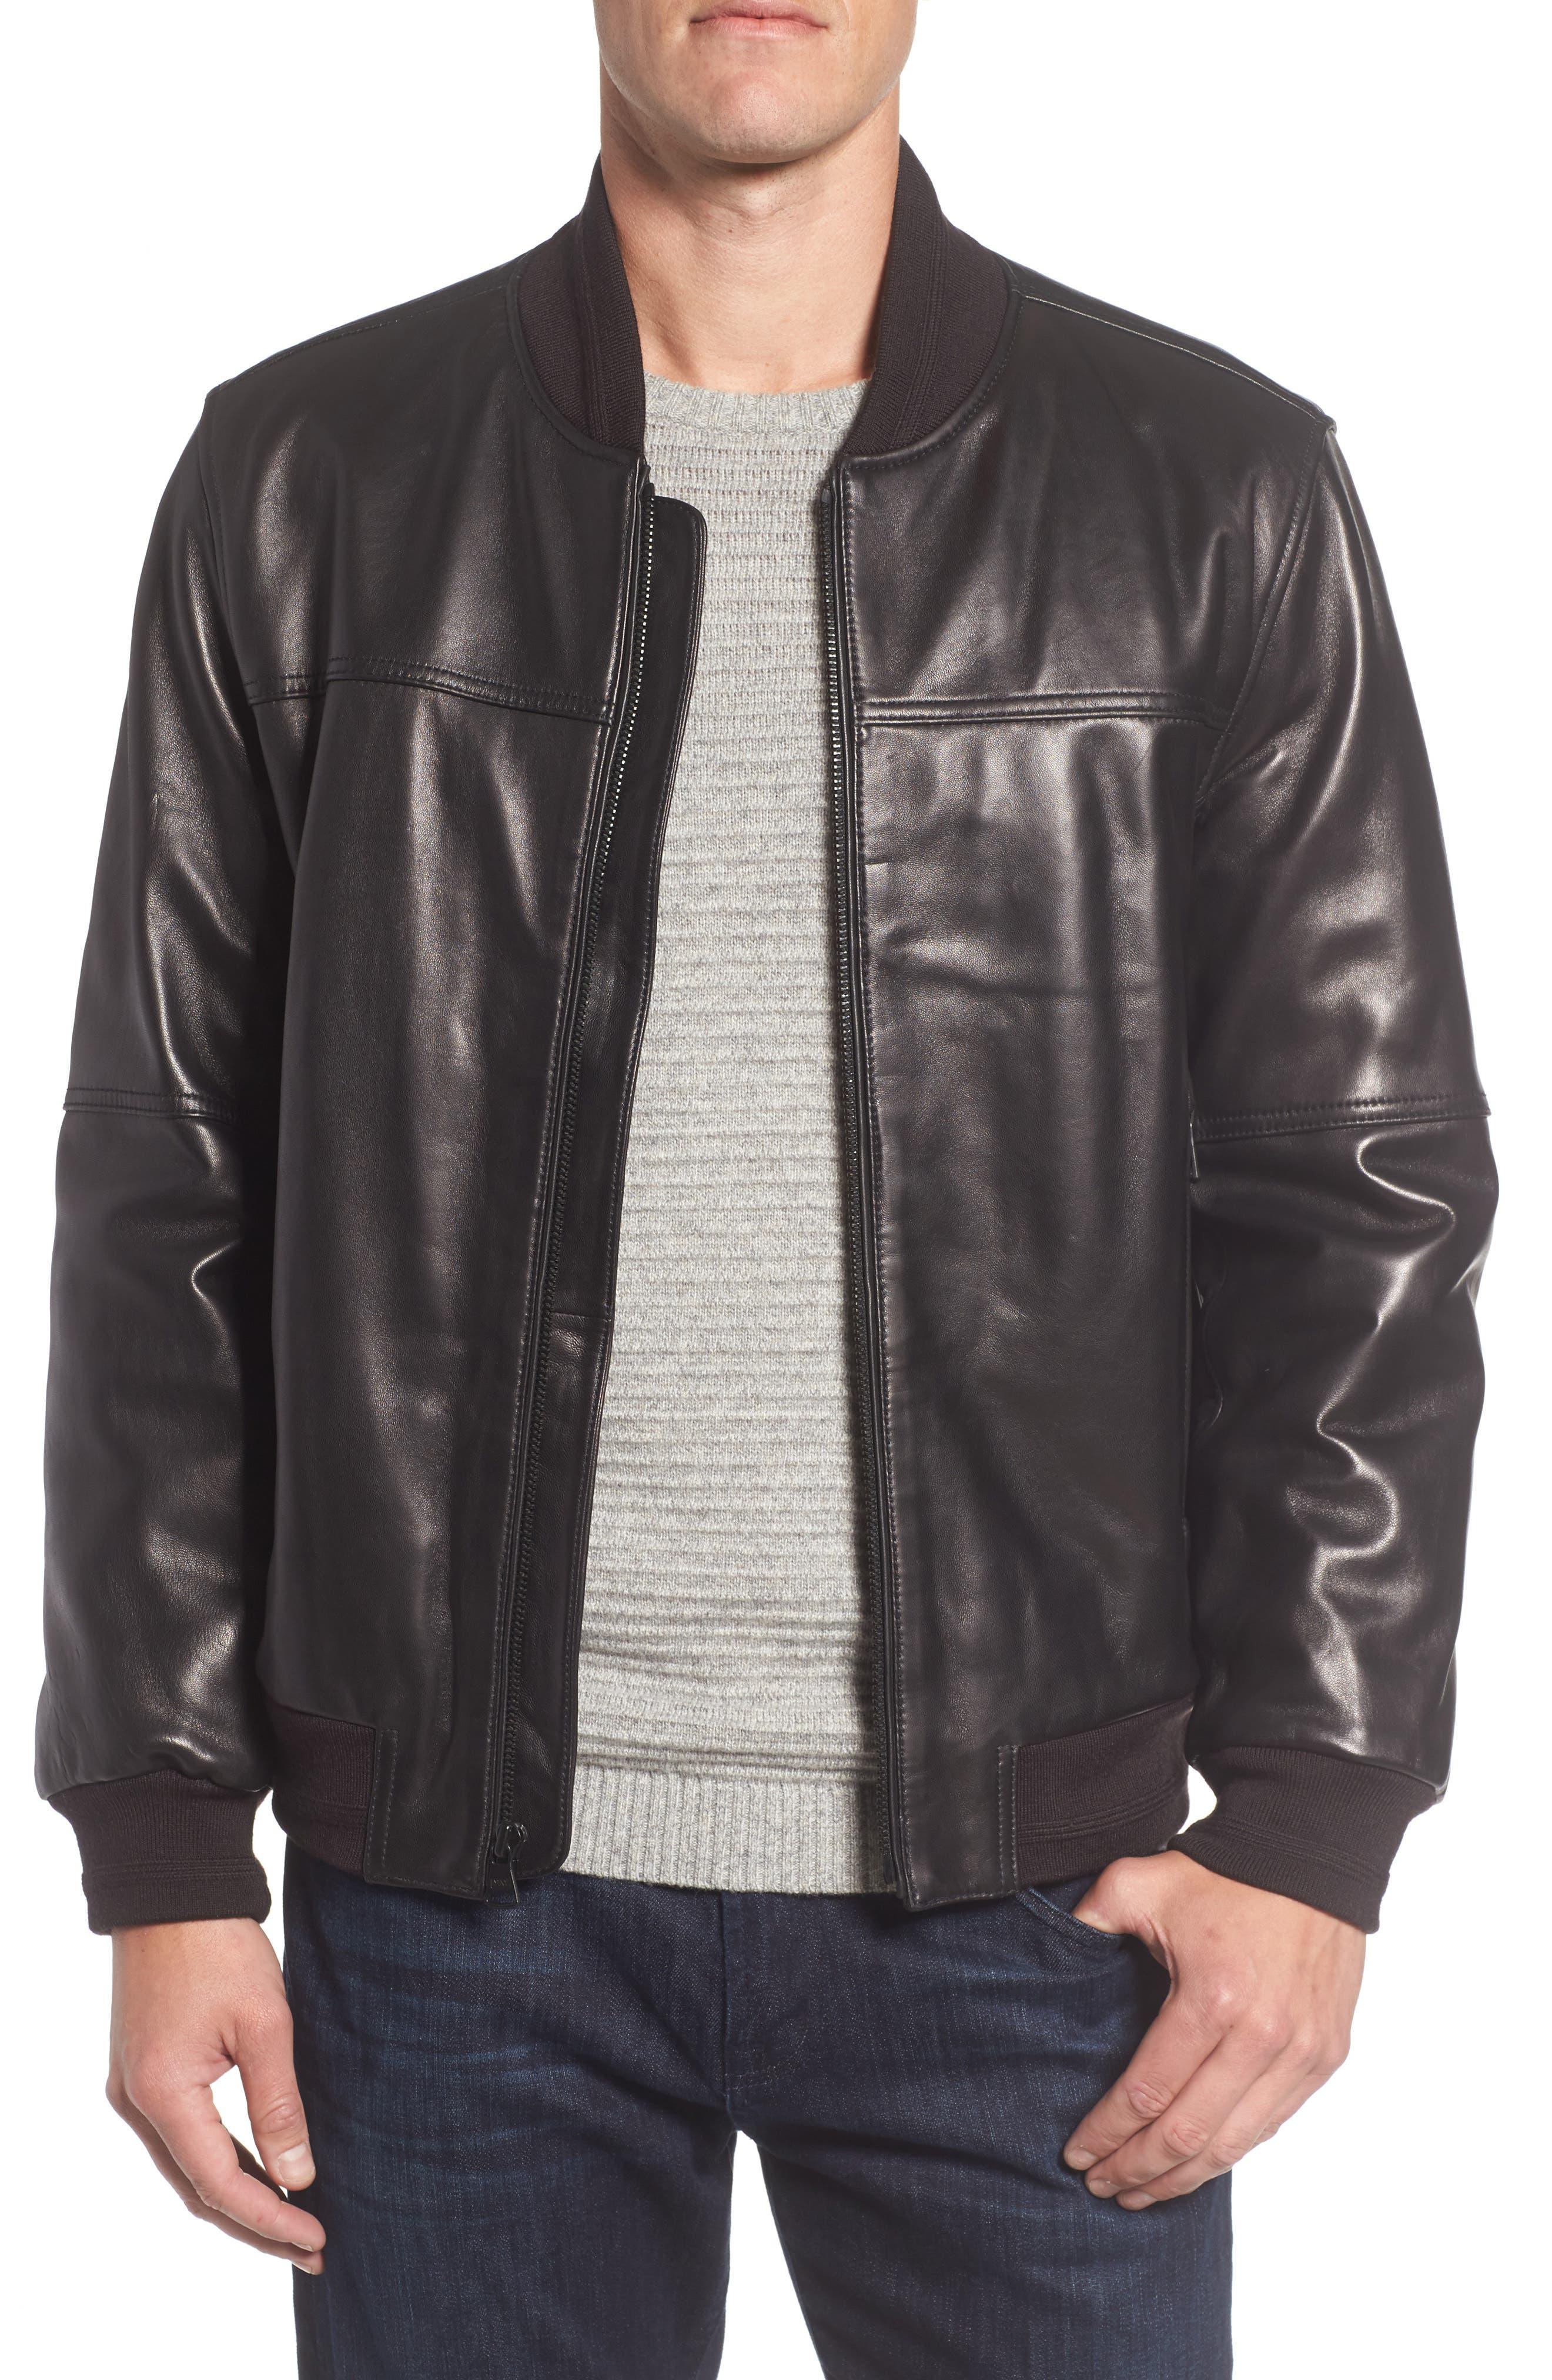 Summit Leather Bomber Jacket,                             Main thumbnail 1, color,                             Black